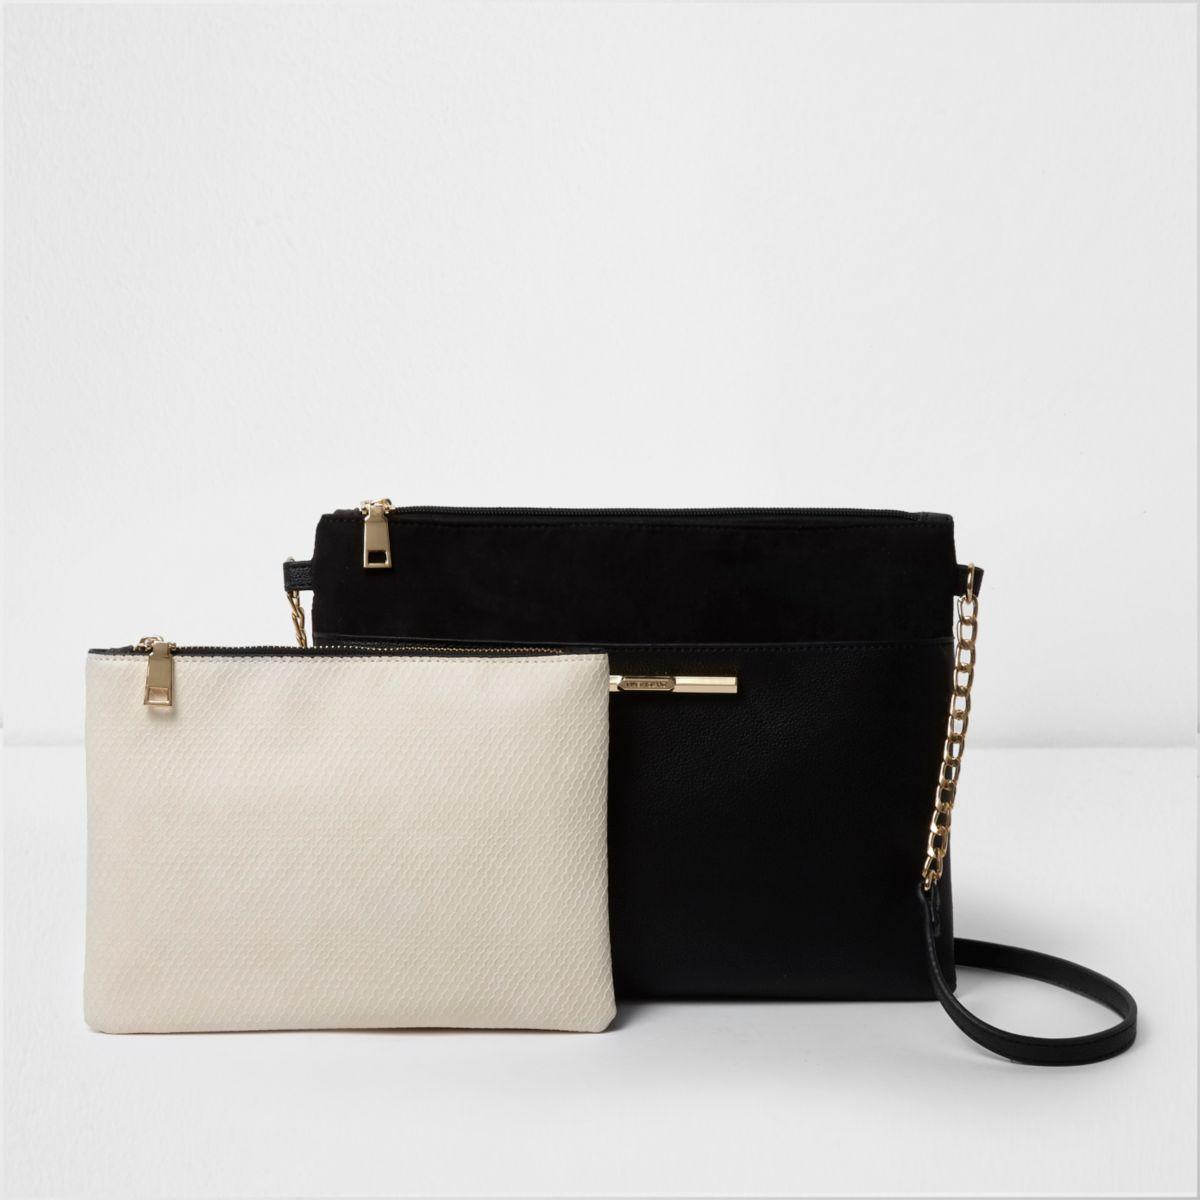 Black cross body bag and cream pouchette